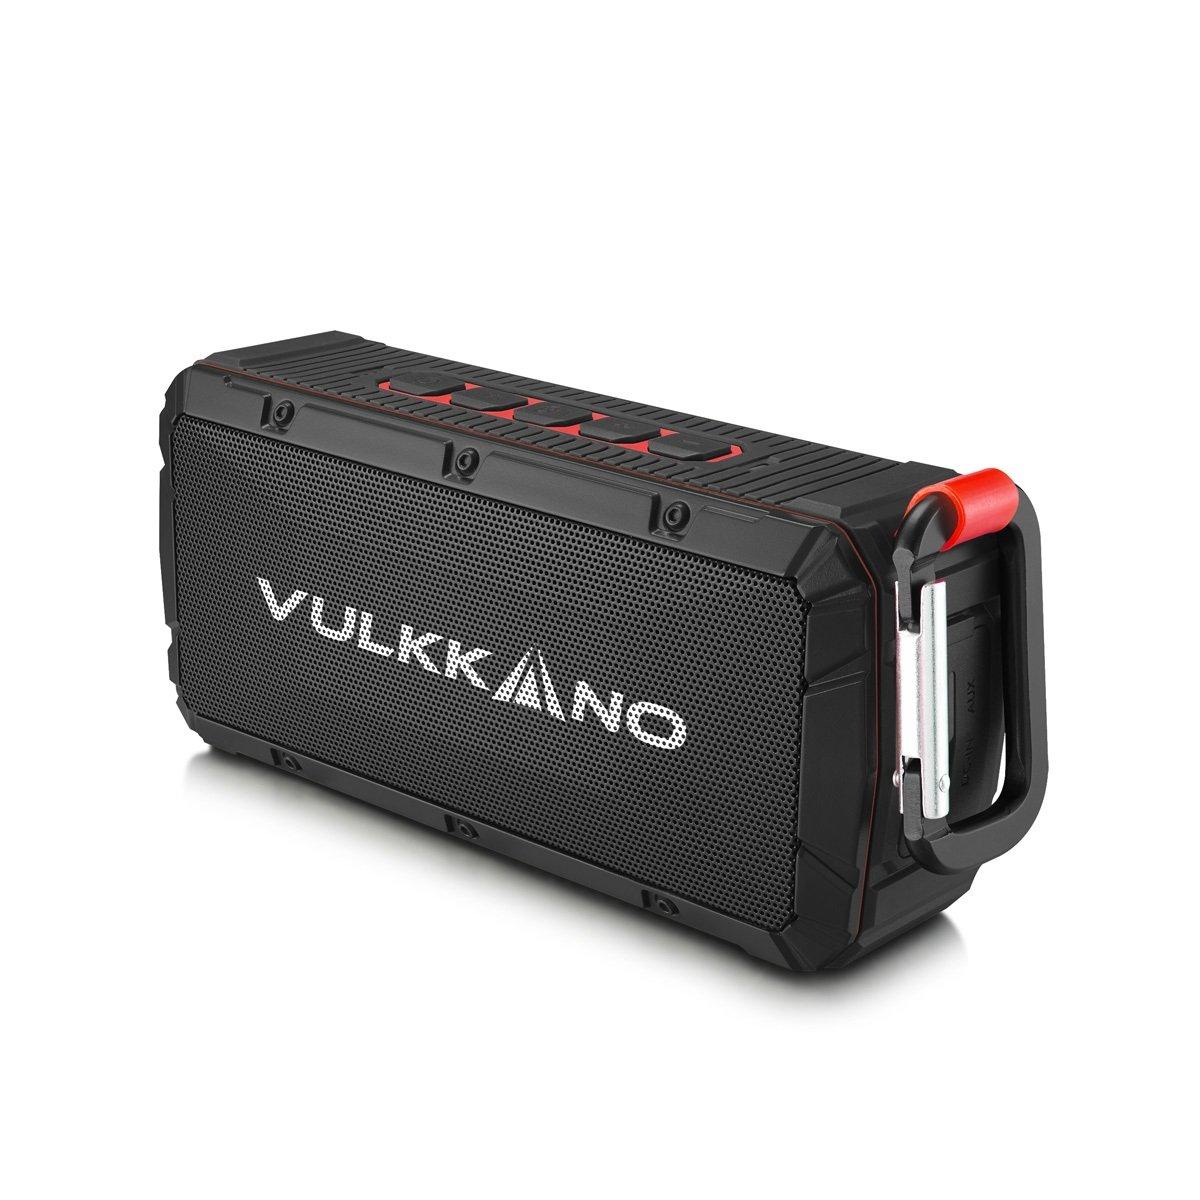 VULKKANO Bullet Altavoz Bluetooth portátil resistente agua arena y golpes W potencia